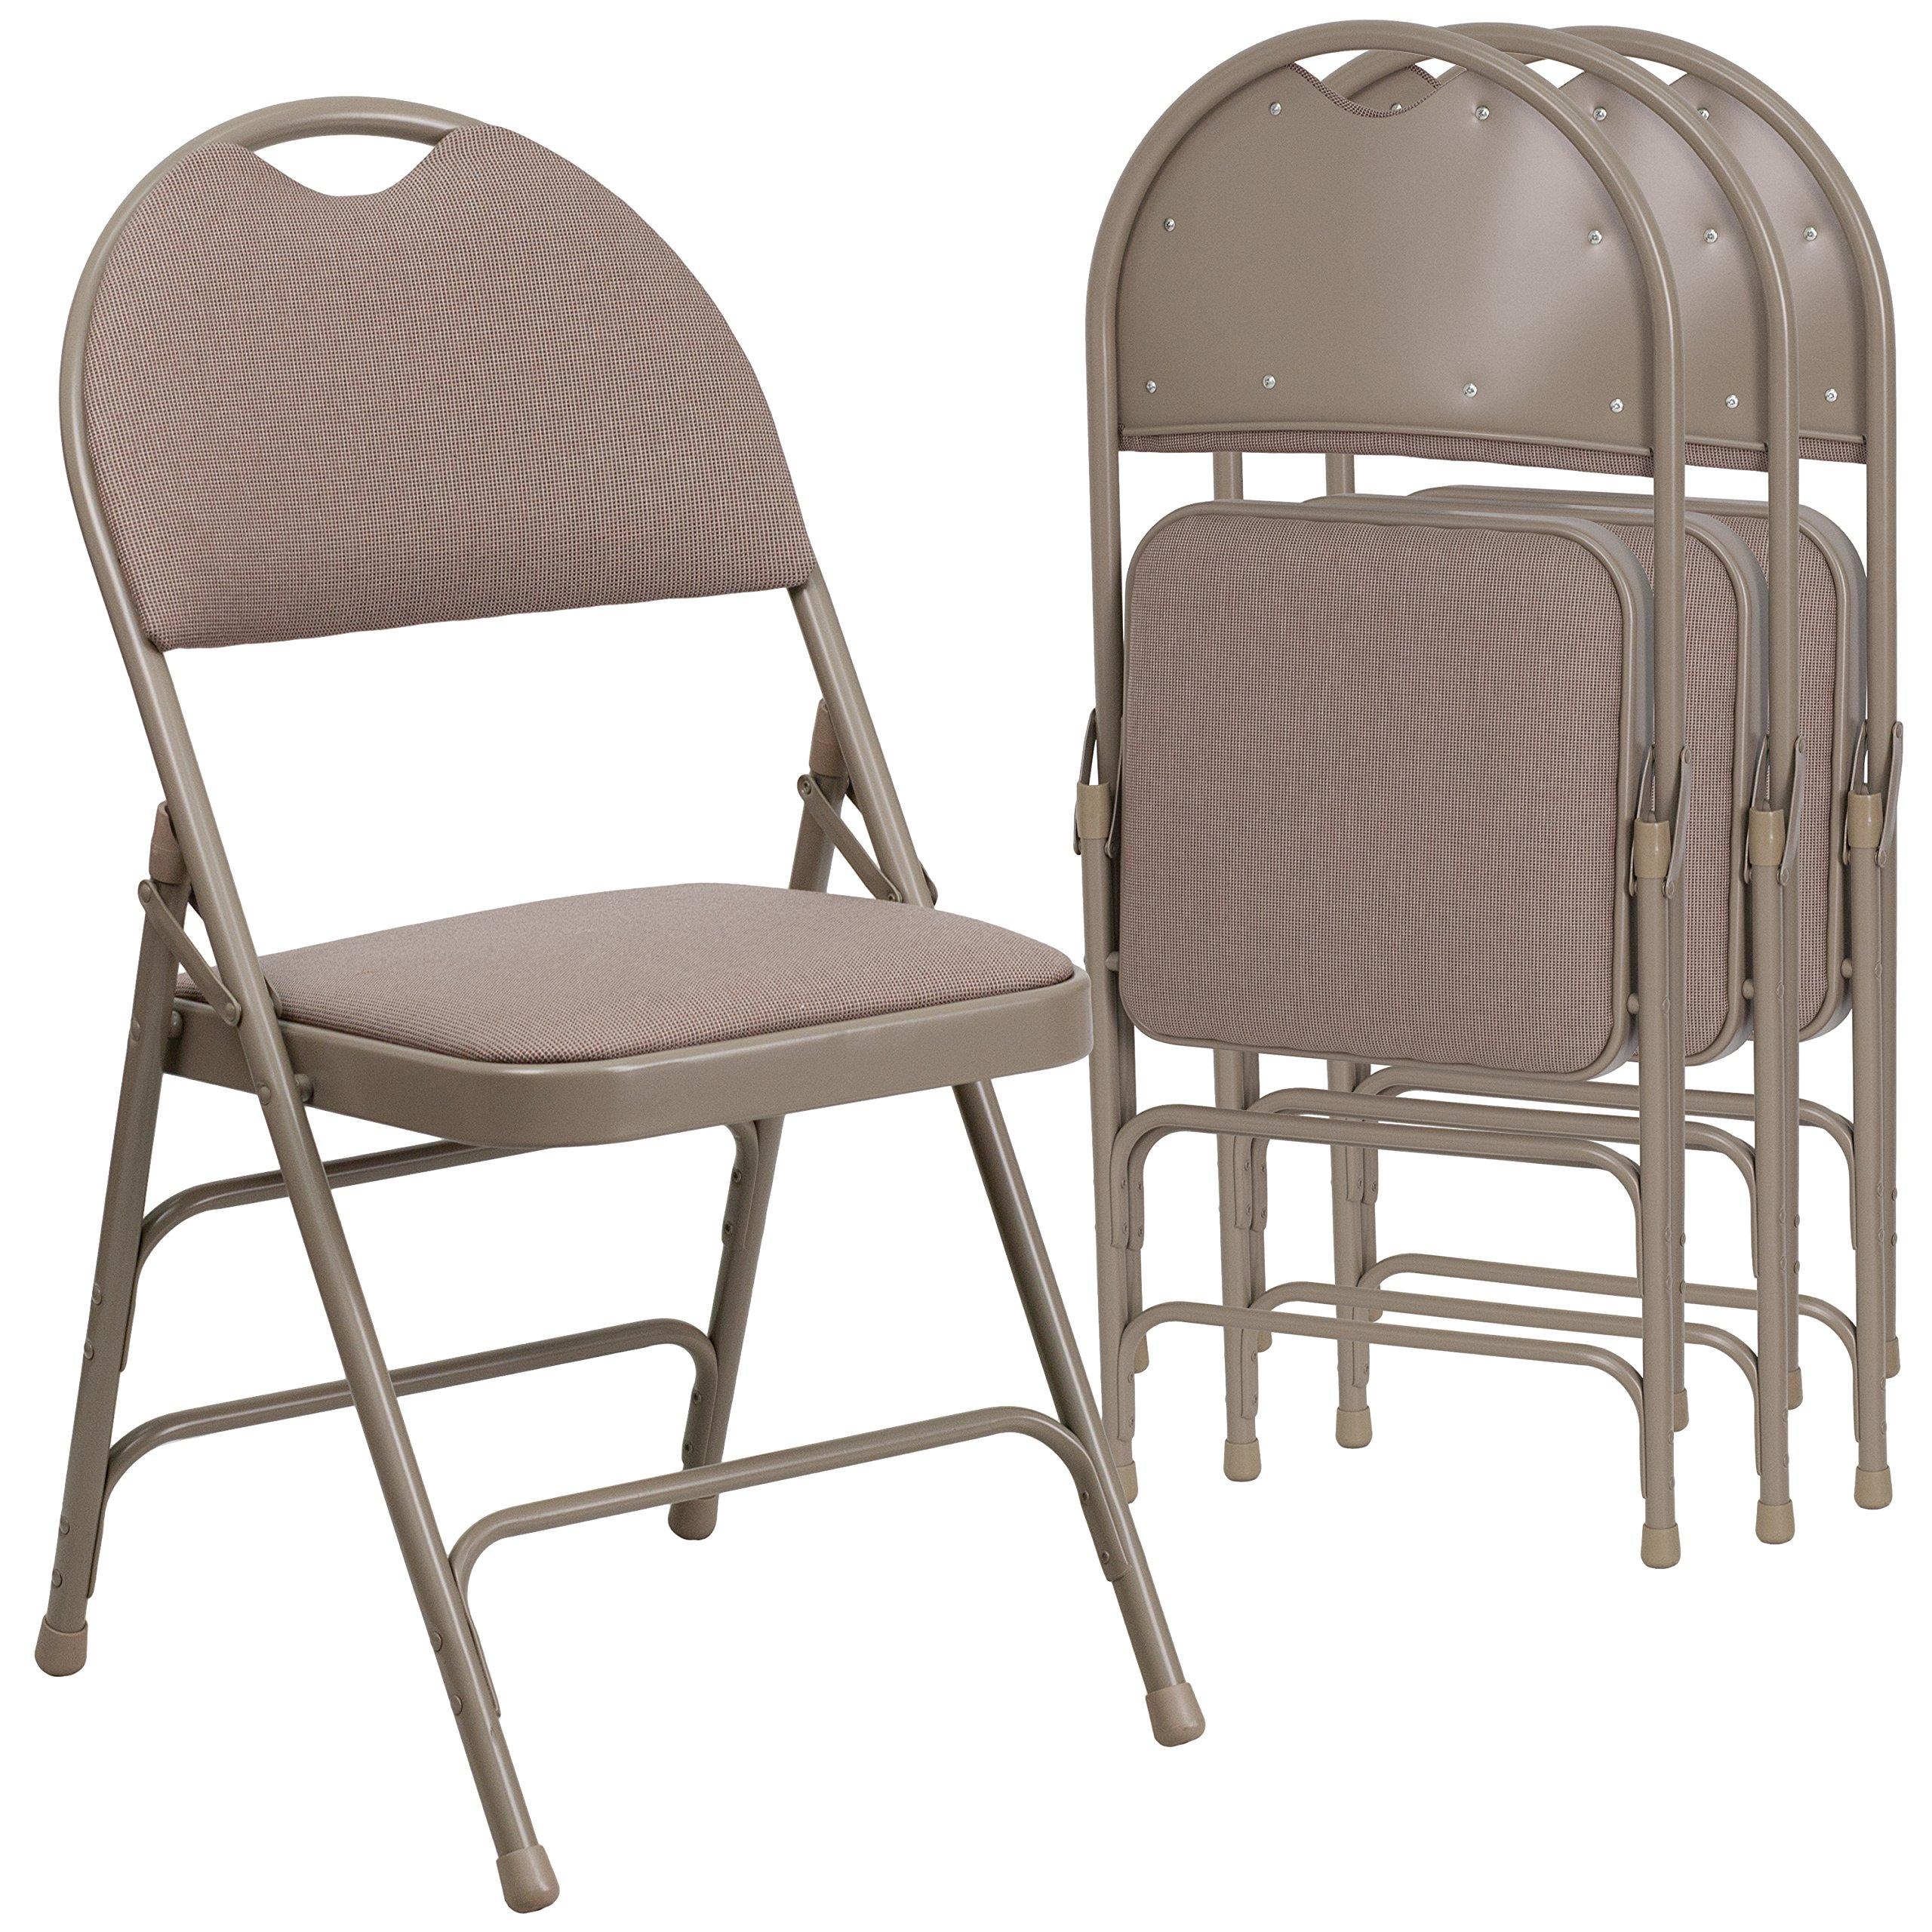 Flash Furniture 4 Pk. HERCULES Series Ultra-Premium Triple Braced Beige Fabric Metal Folding Chair with Easy-Carry Handle